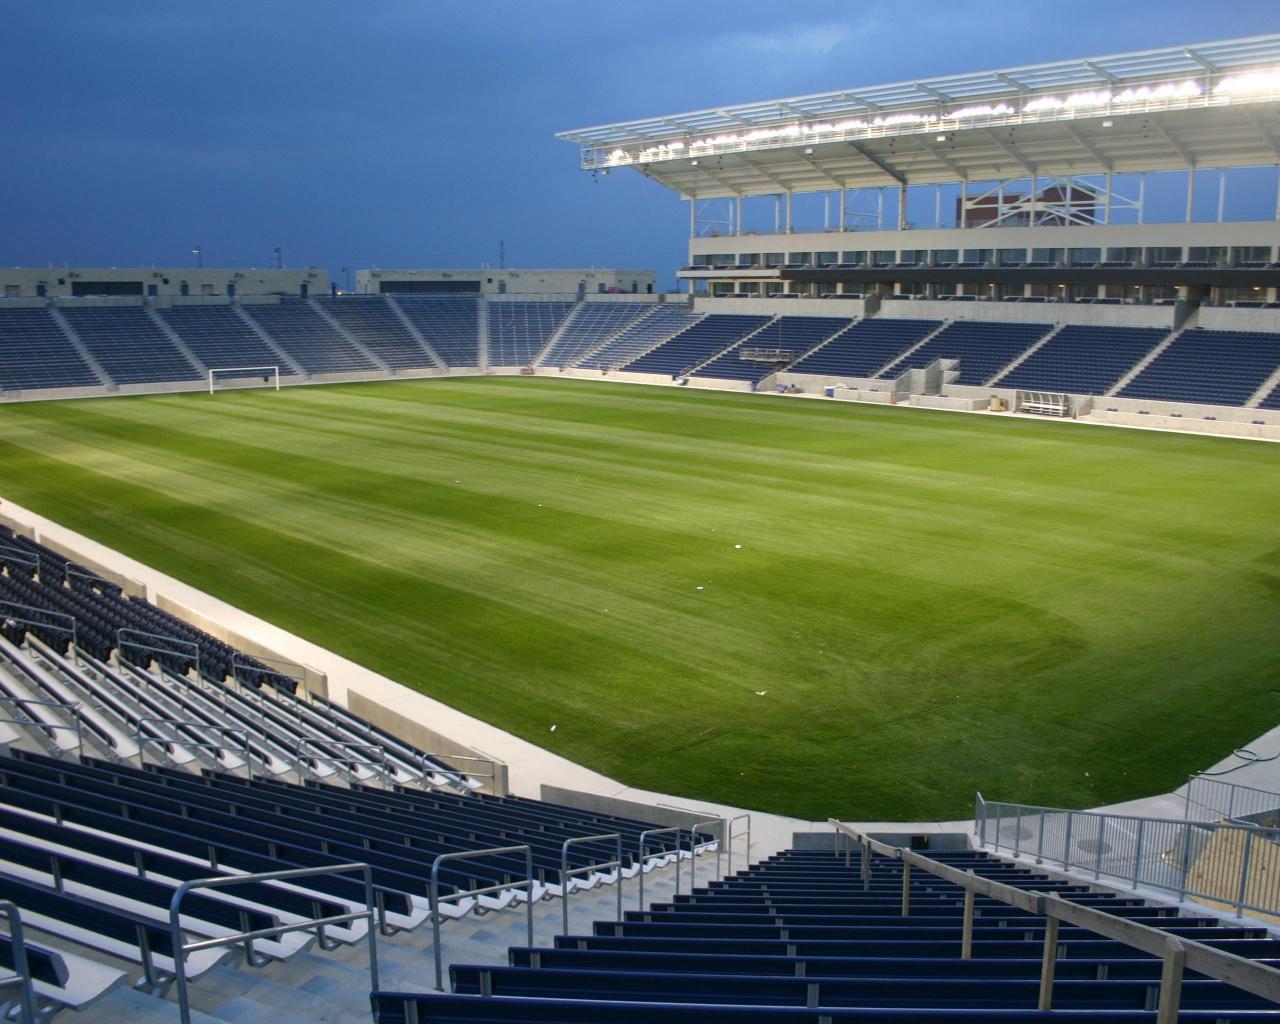 SUN\s\stadium\soccer 44 images 1280x1024